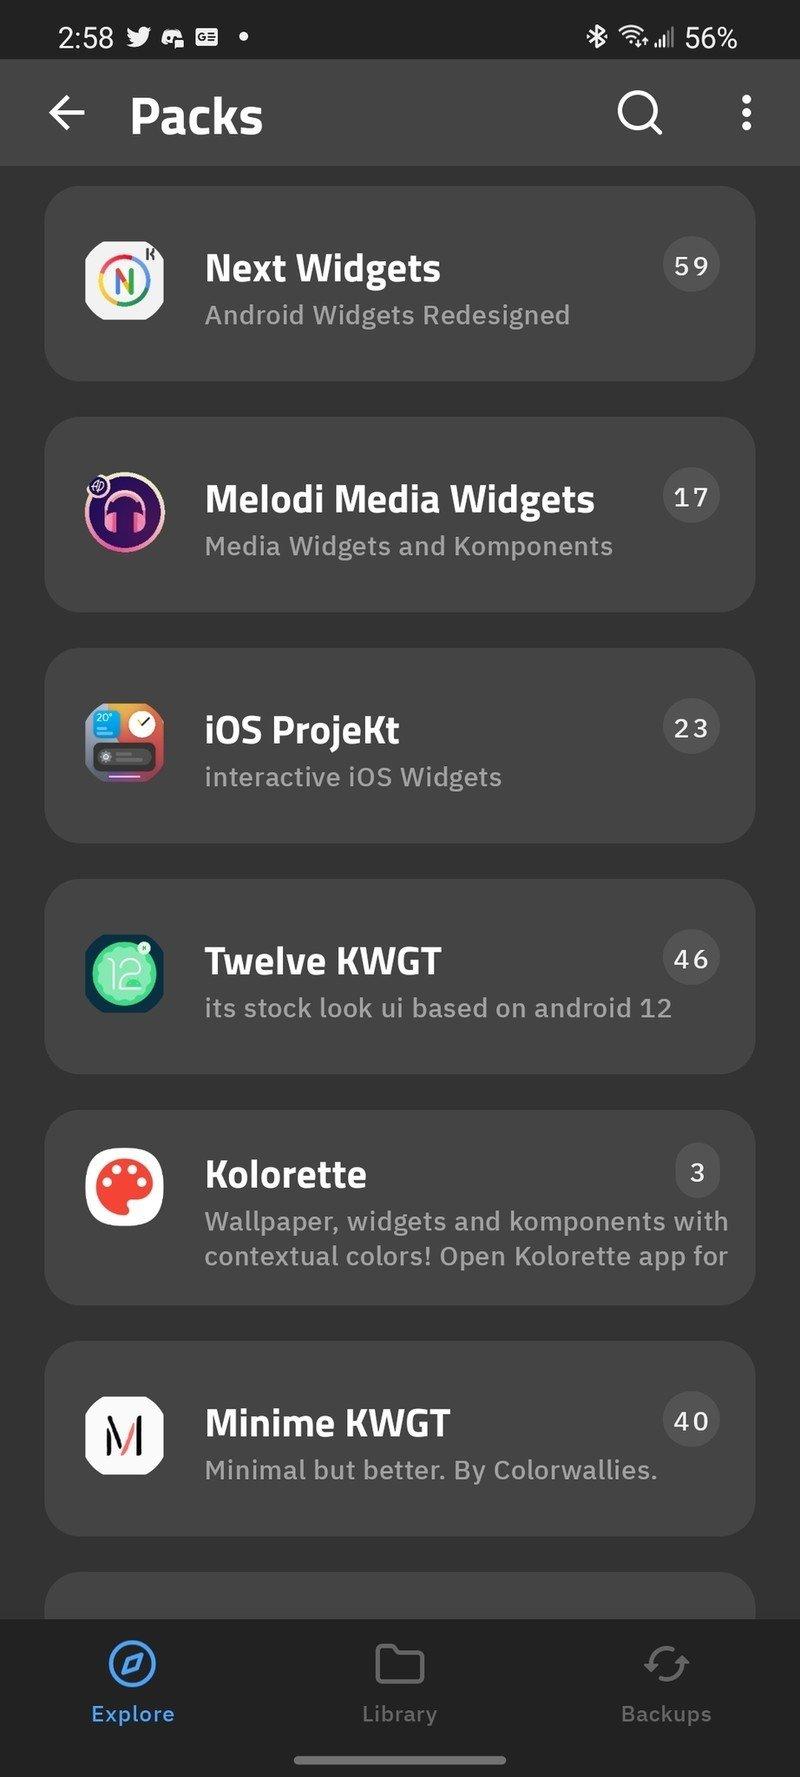 adding-kwgt-to-pride-theme-7.jpg